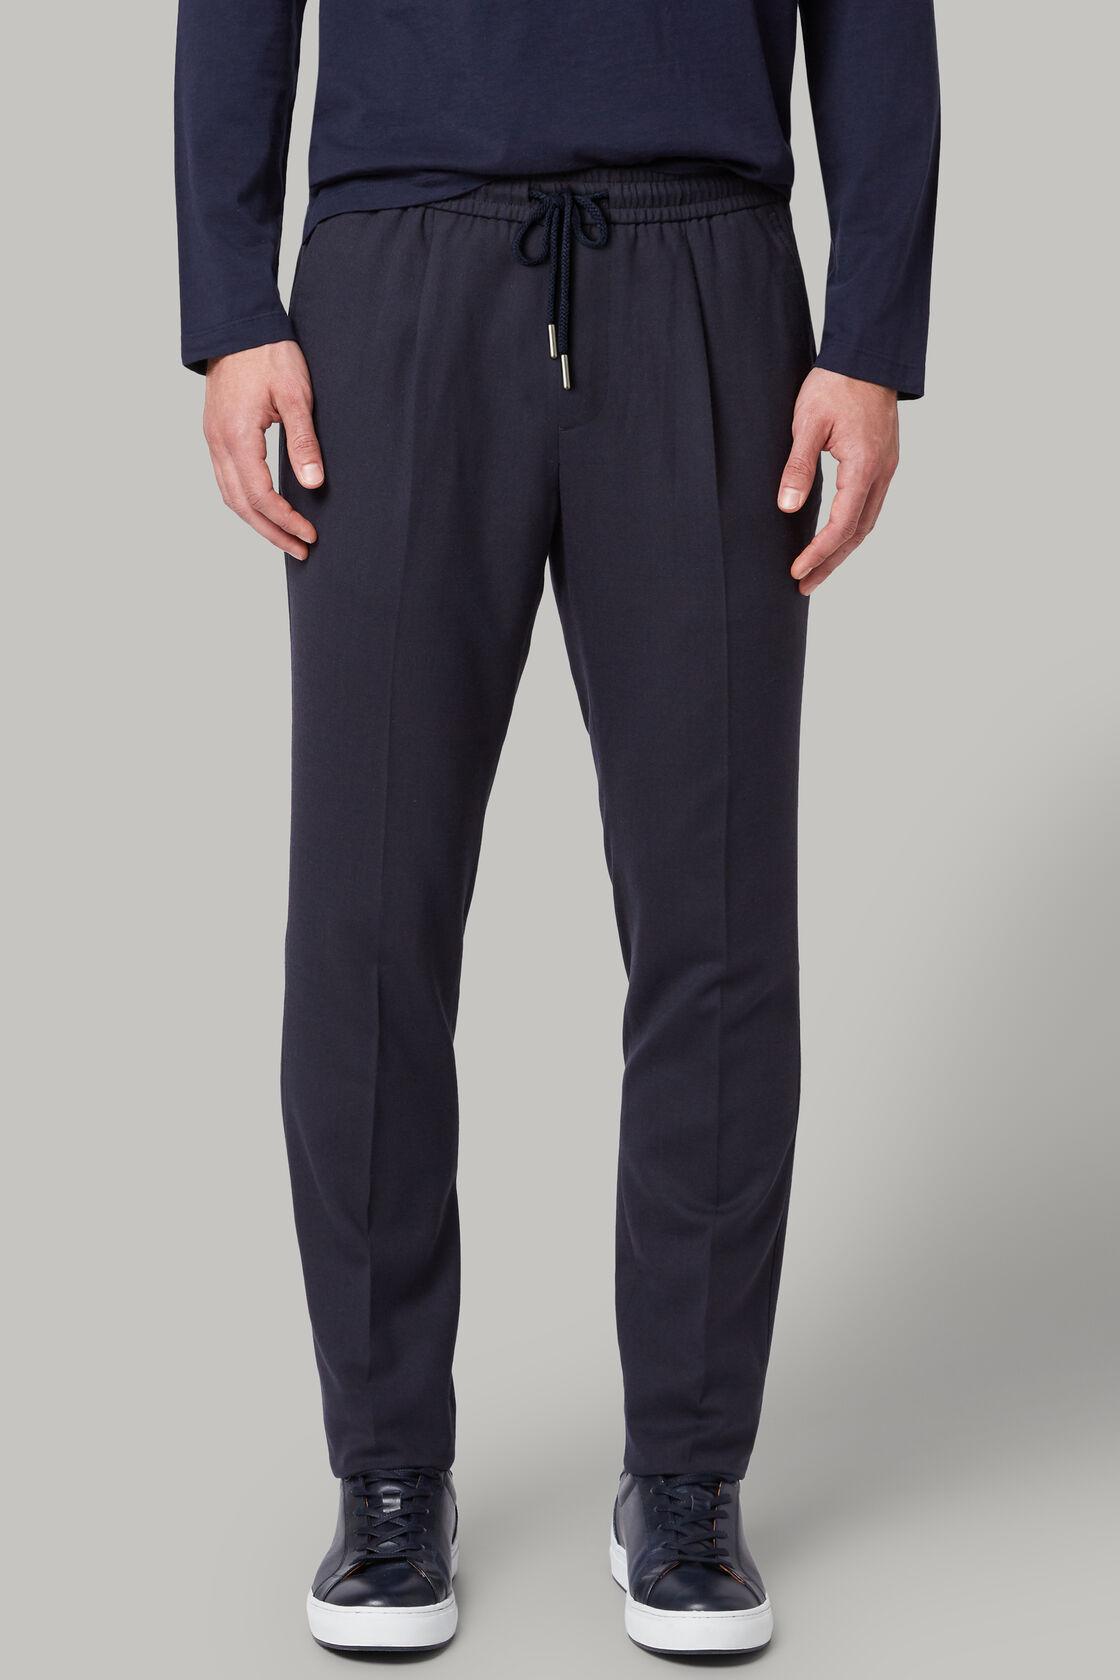 Pantaloni in lana washable regular fit, Navy, hi-res